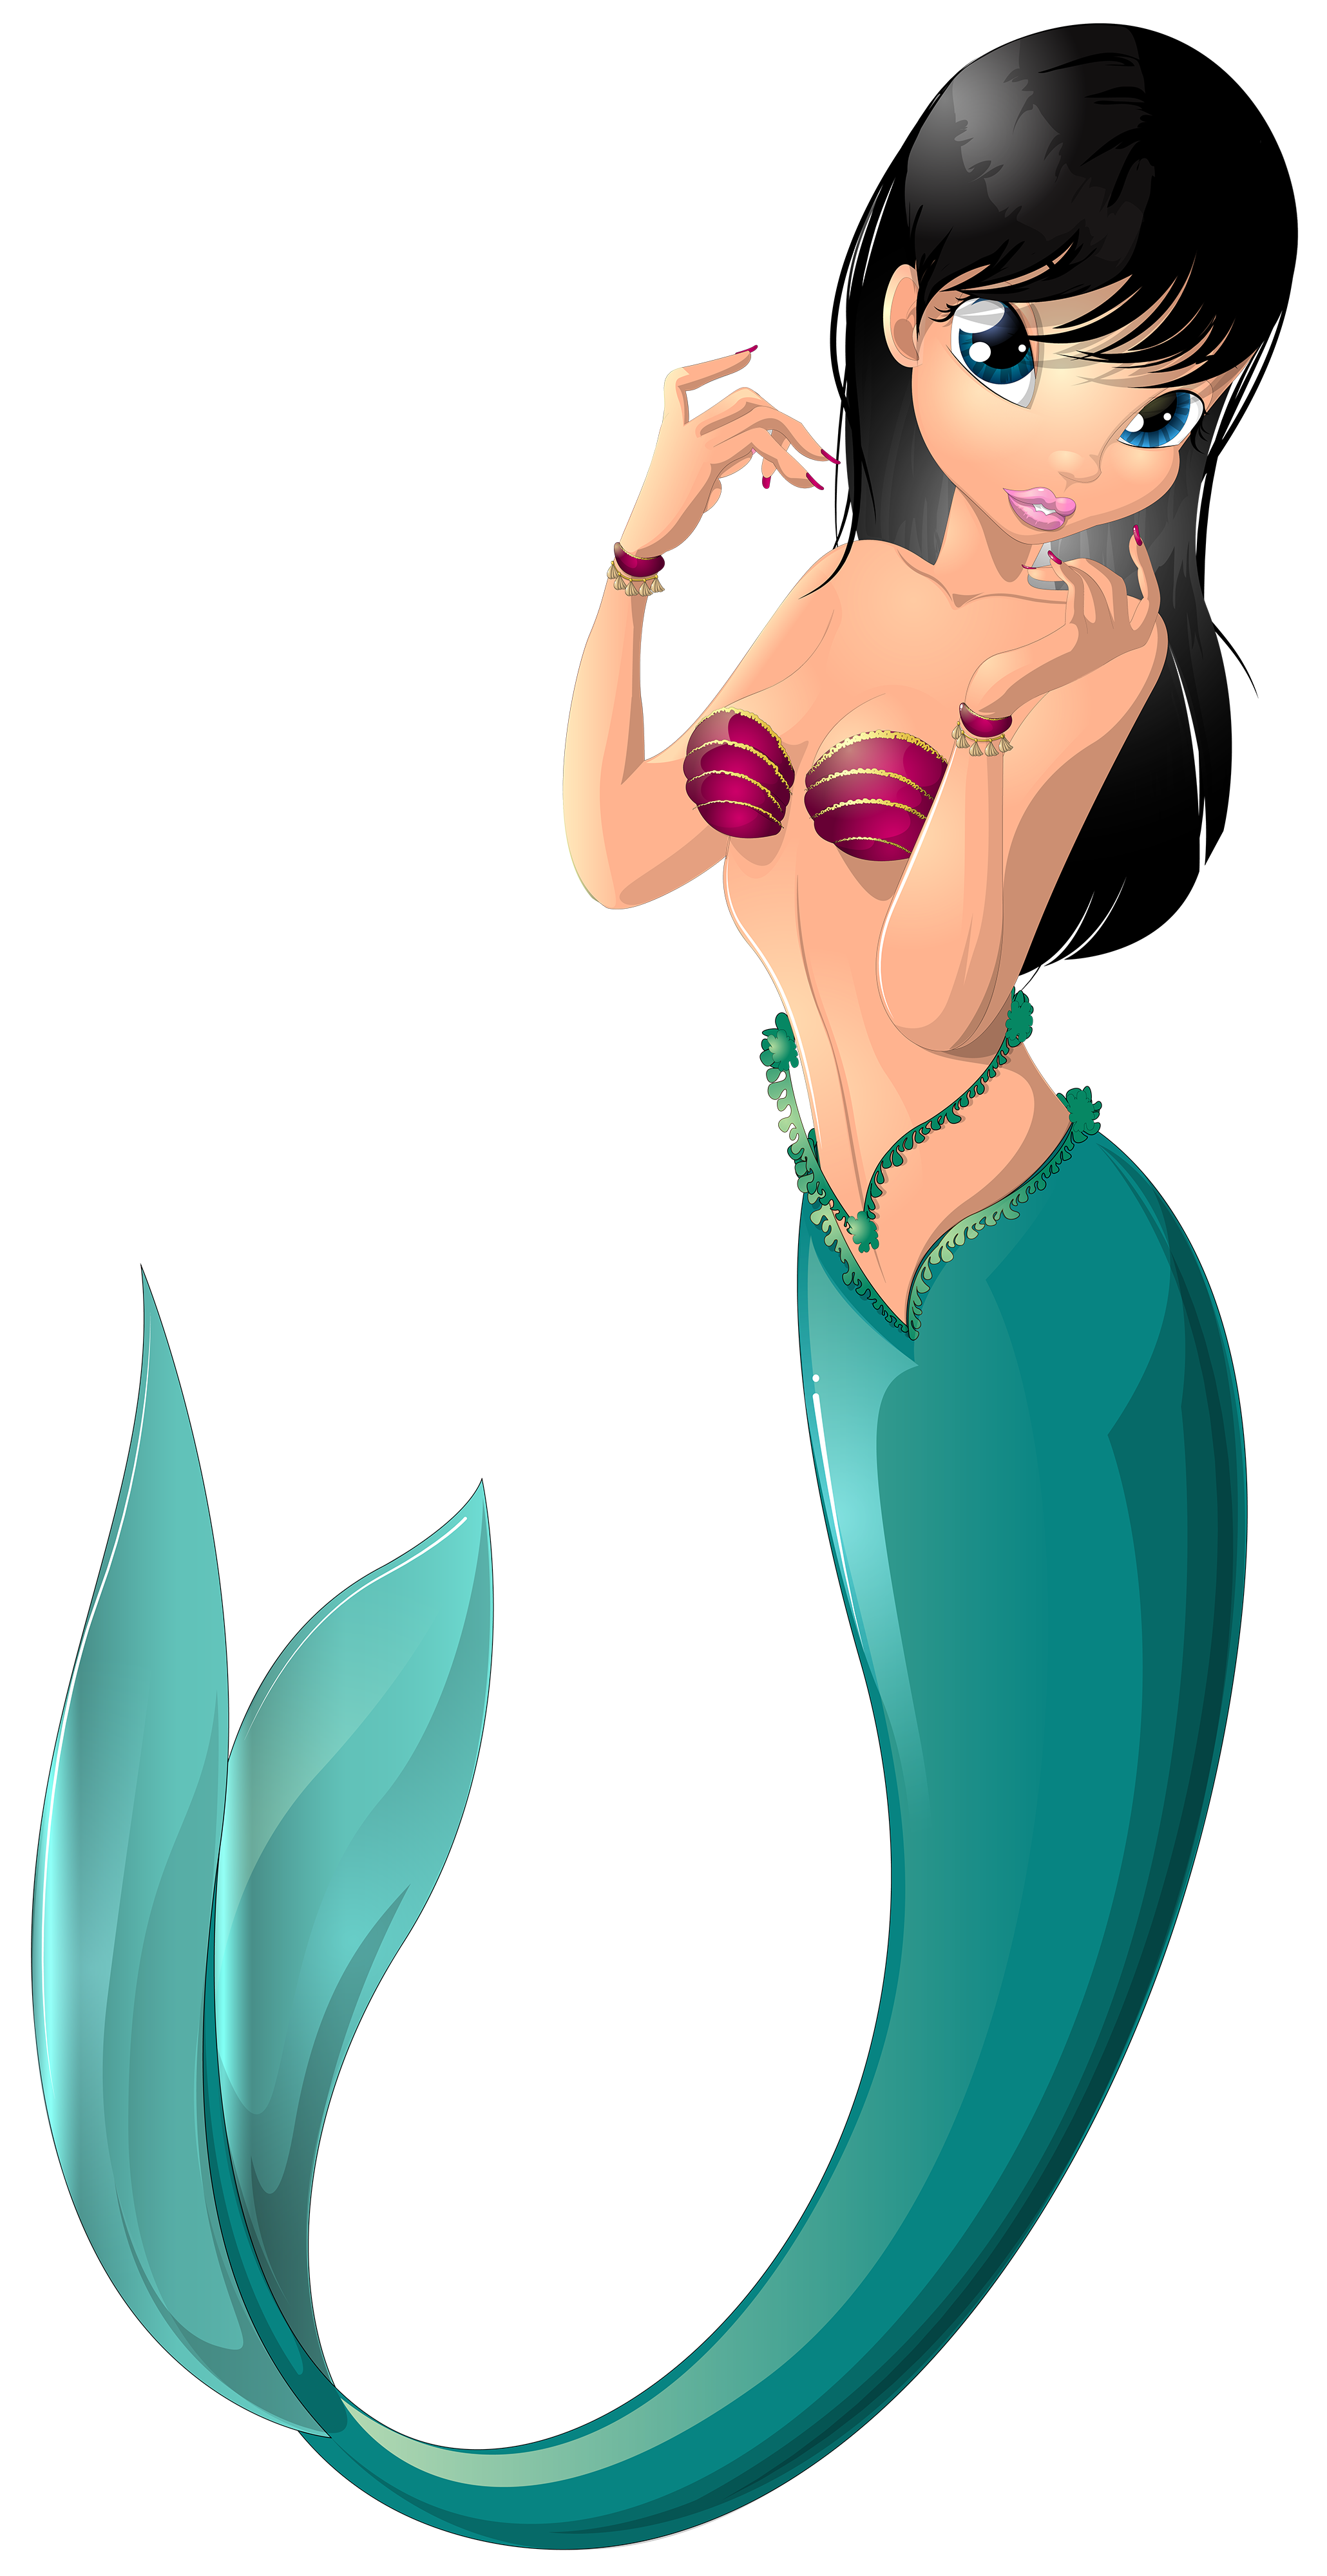 2060x4000 Mermaid Clip Art Image